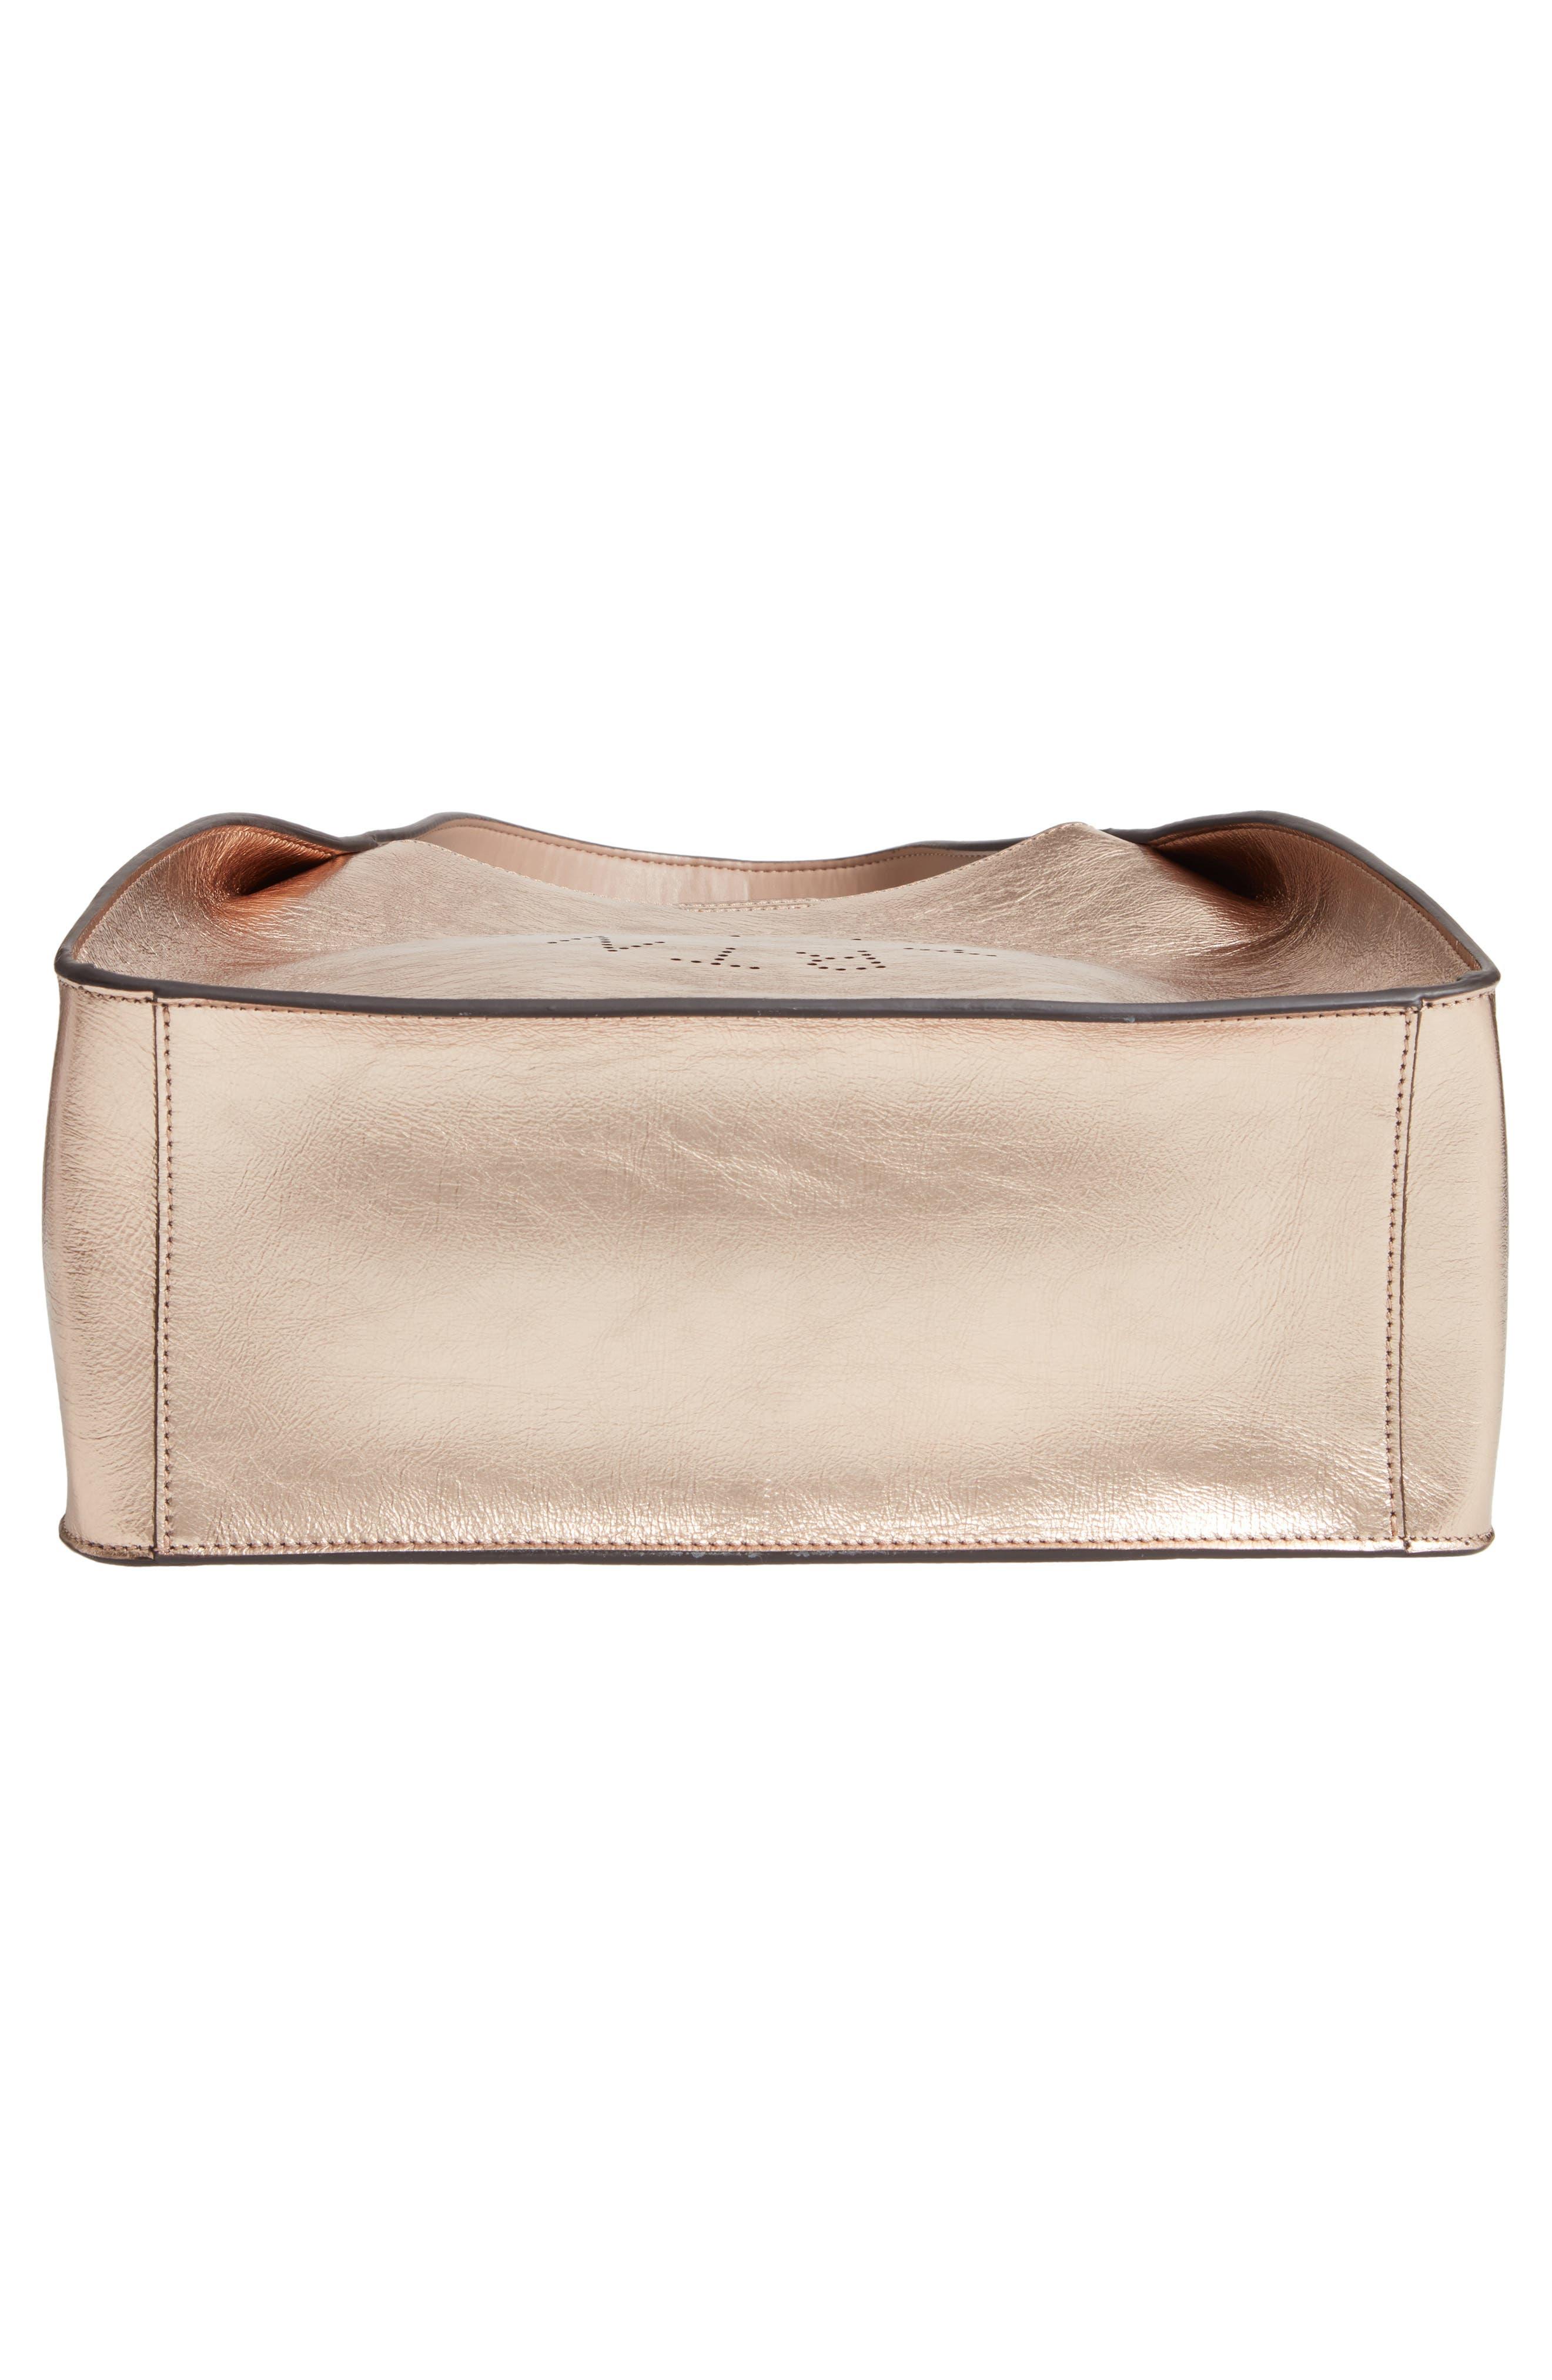 STELLA MCCARTNEY, Perforated Logo Metallic Faux Leather Satchel, Alternate thumbnail 6, color, ROSE GOLD